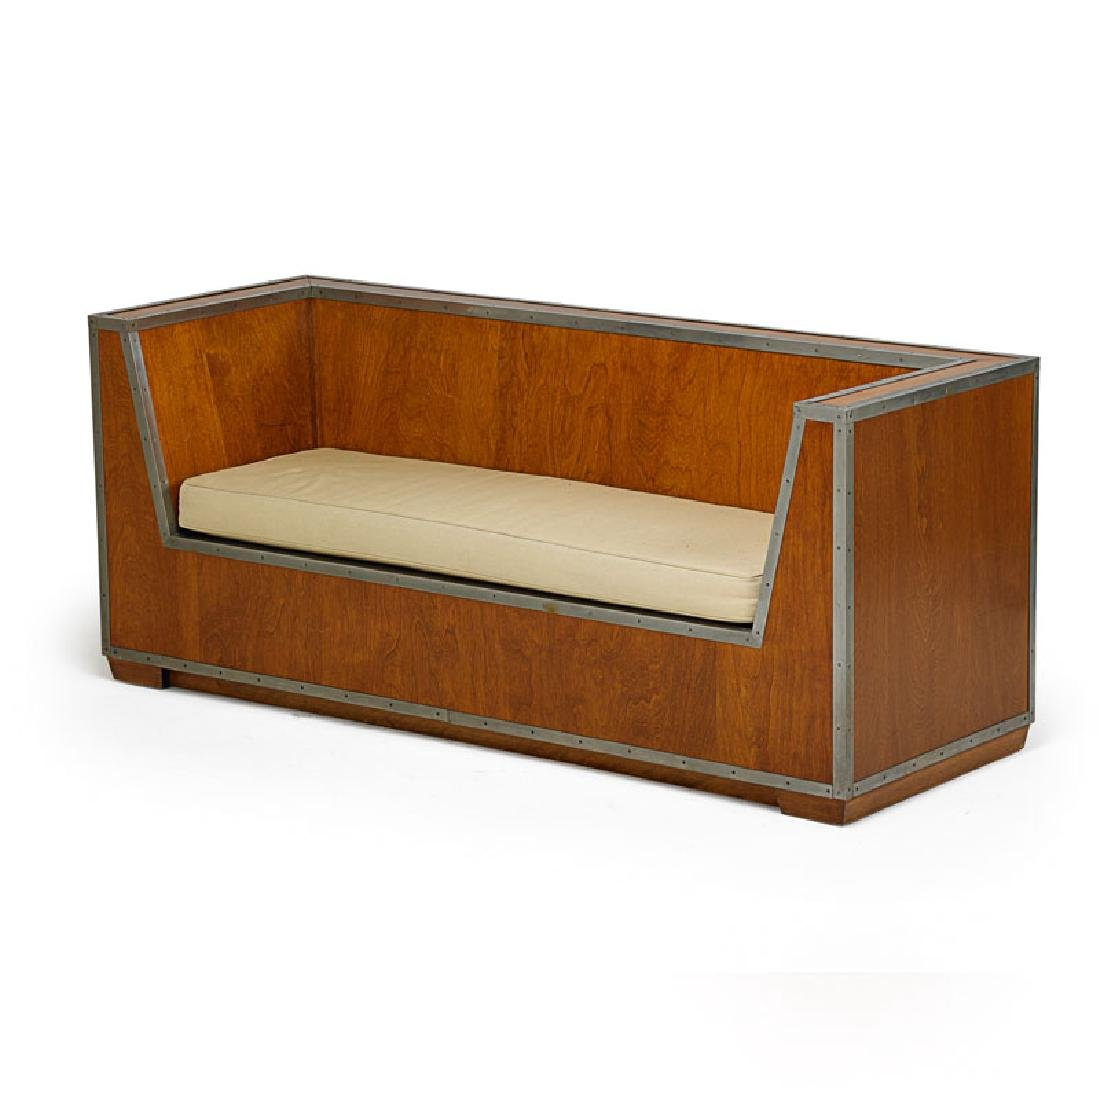 PAUL FRANKL Art Deco sofa